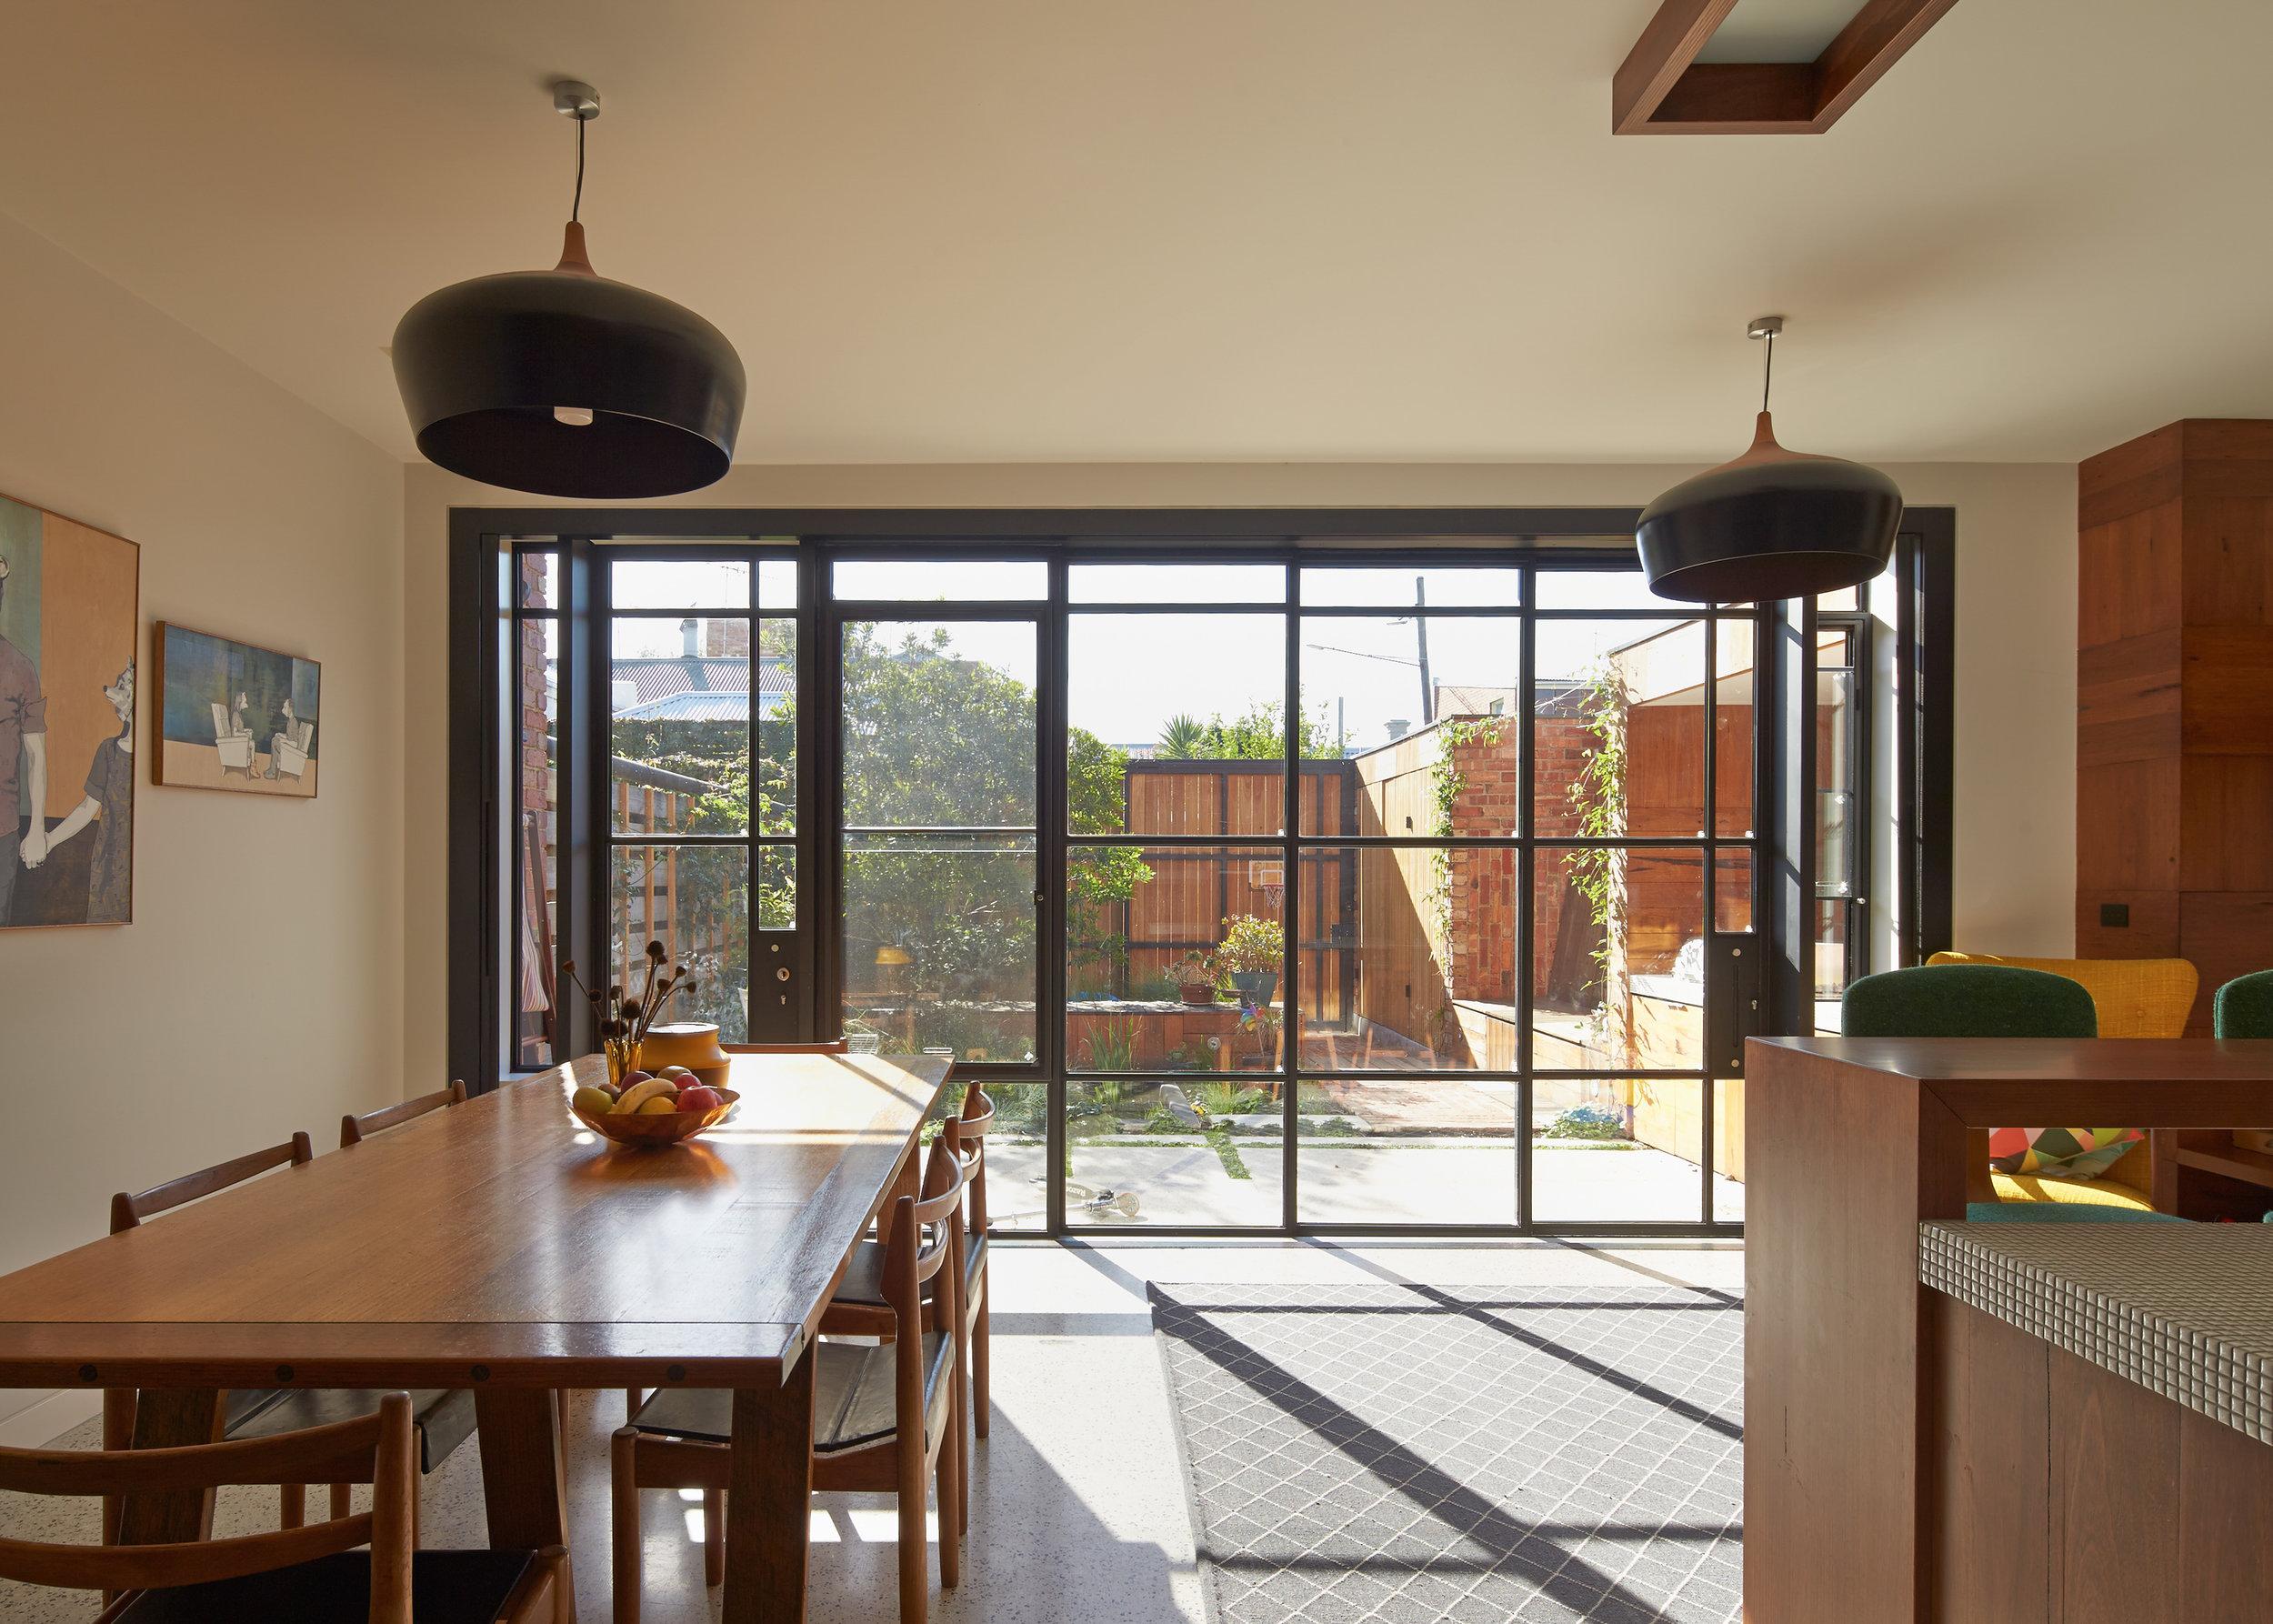 cubo-house-phooey-architects-the-design-emotive-17.jpg